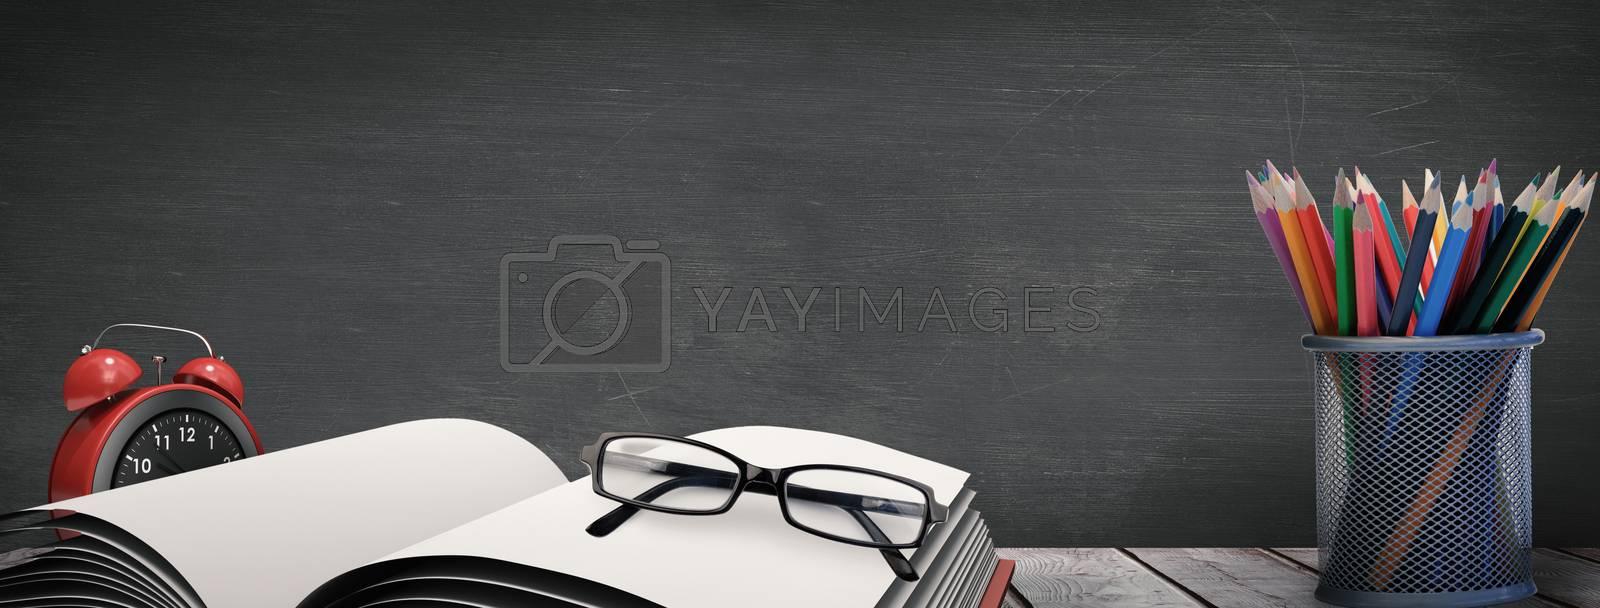 School supplies on desk against black background